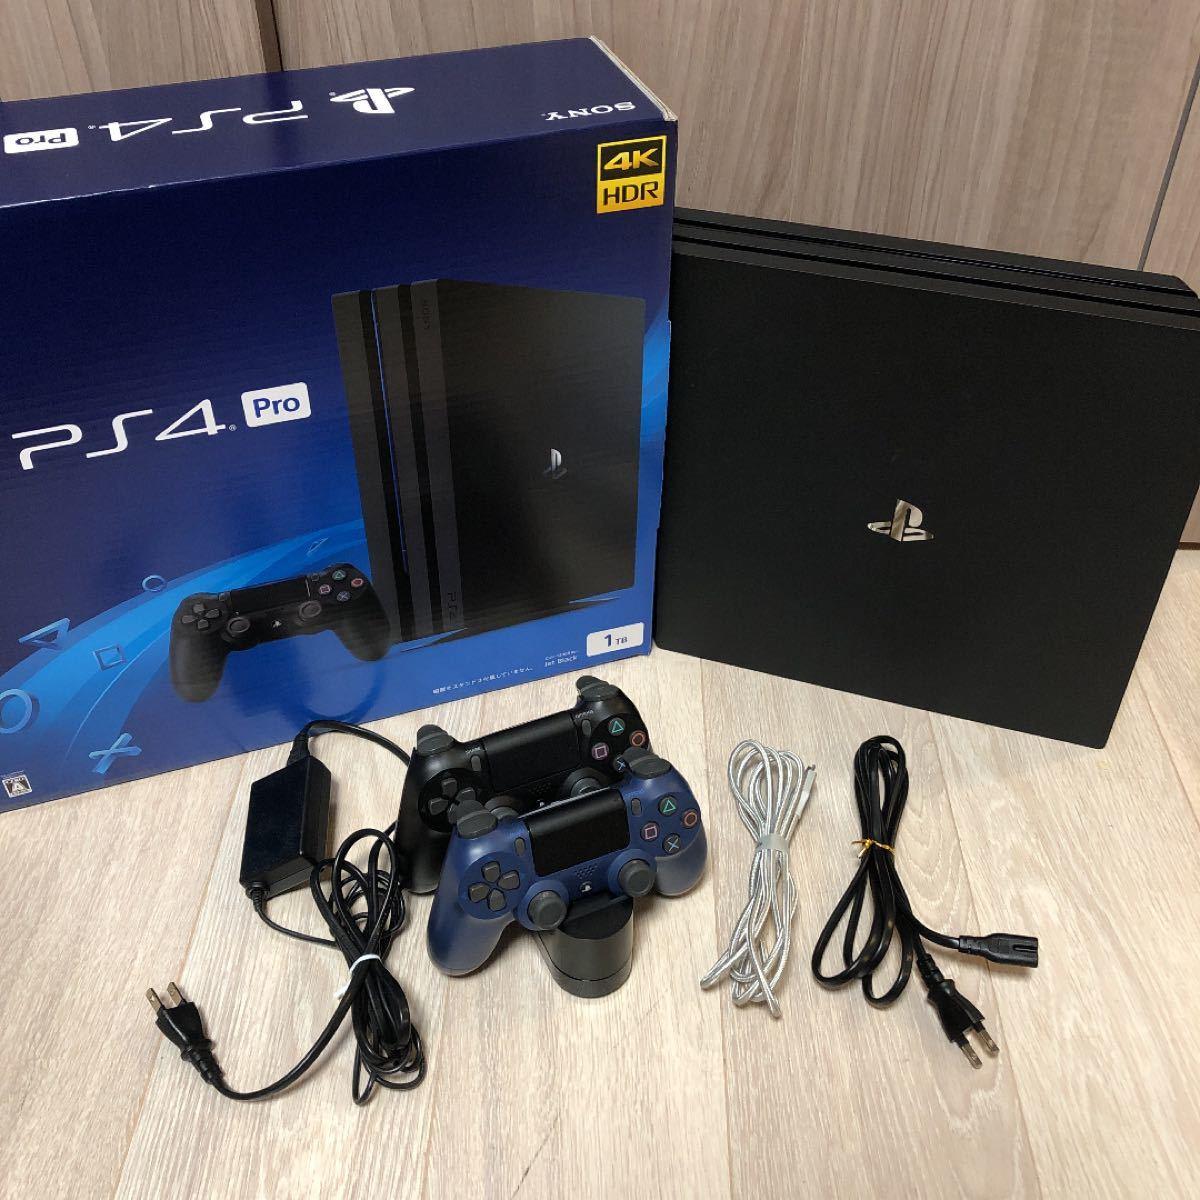 PlayStation4 Pro1TB CUH-7200BB01 PS4